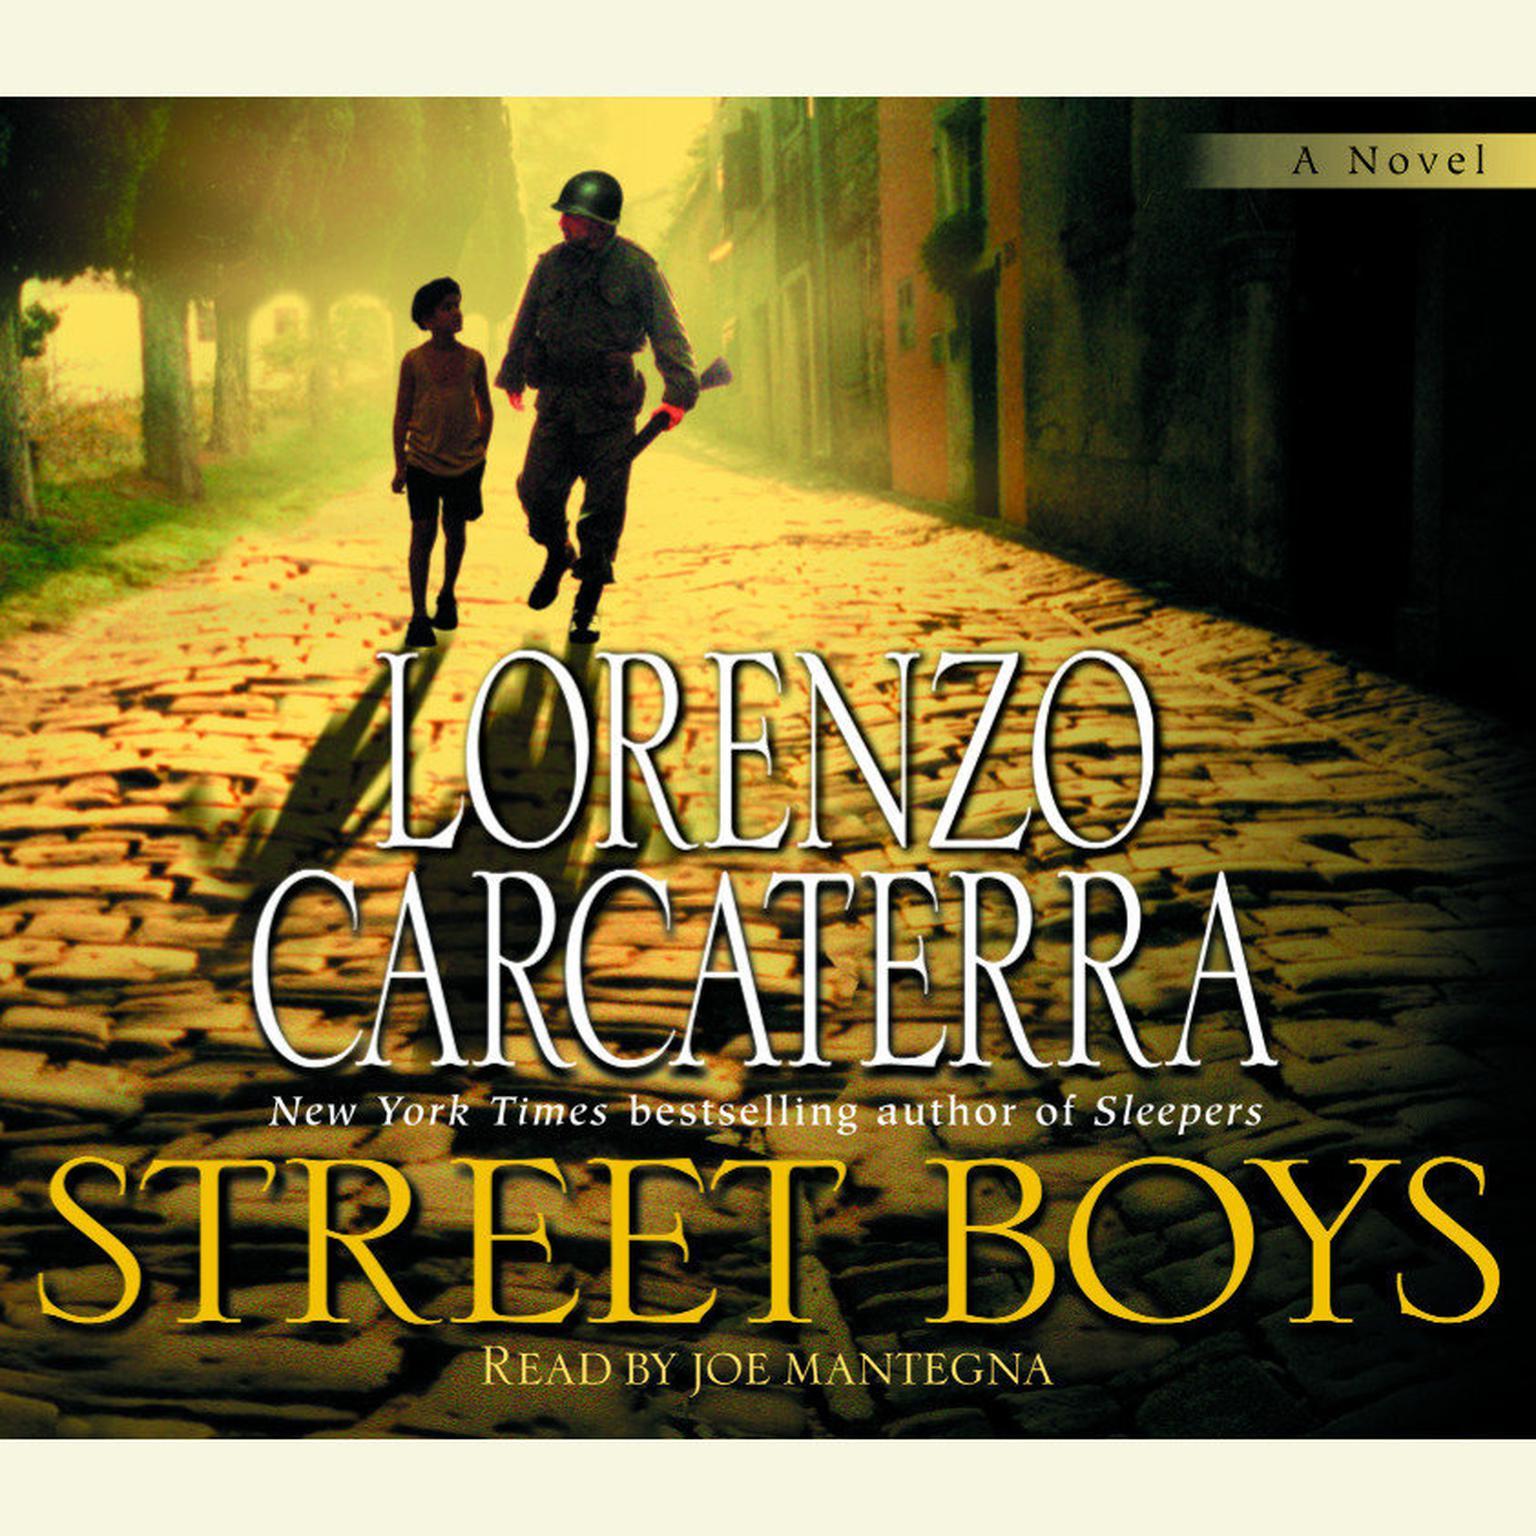 Printable Street Boys Audiobook Cover Art